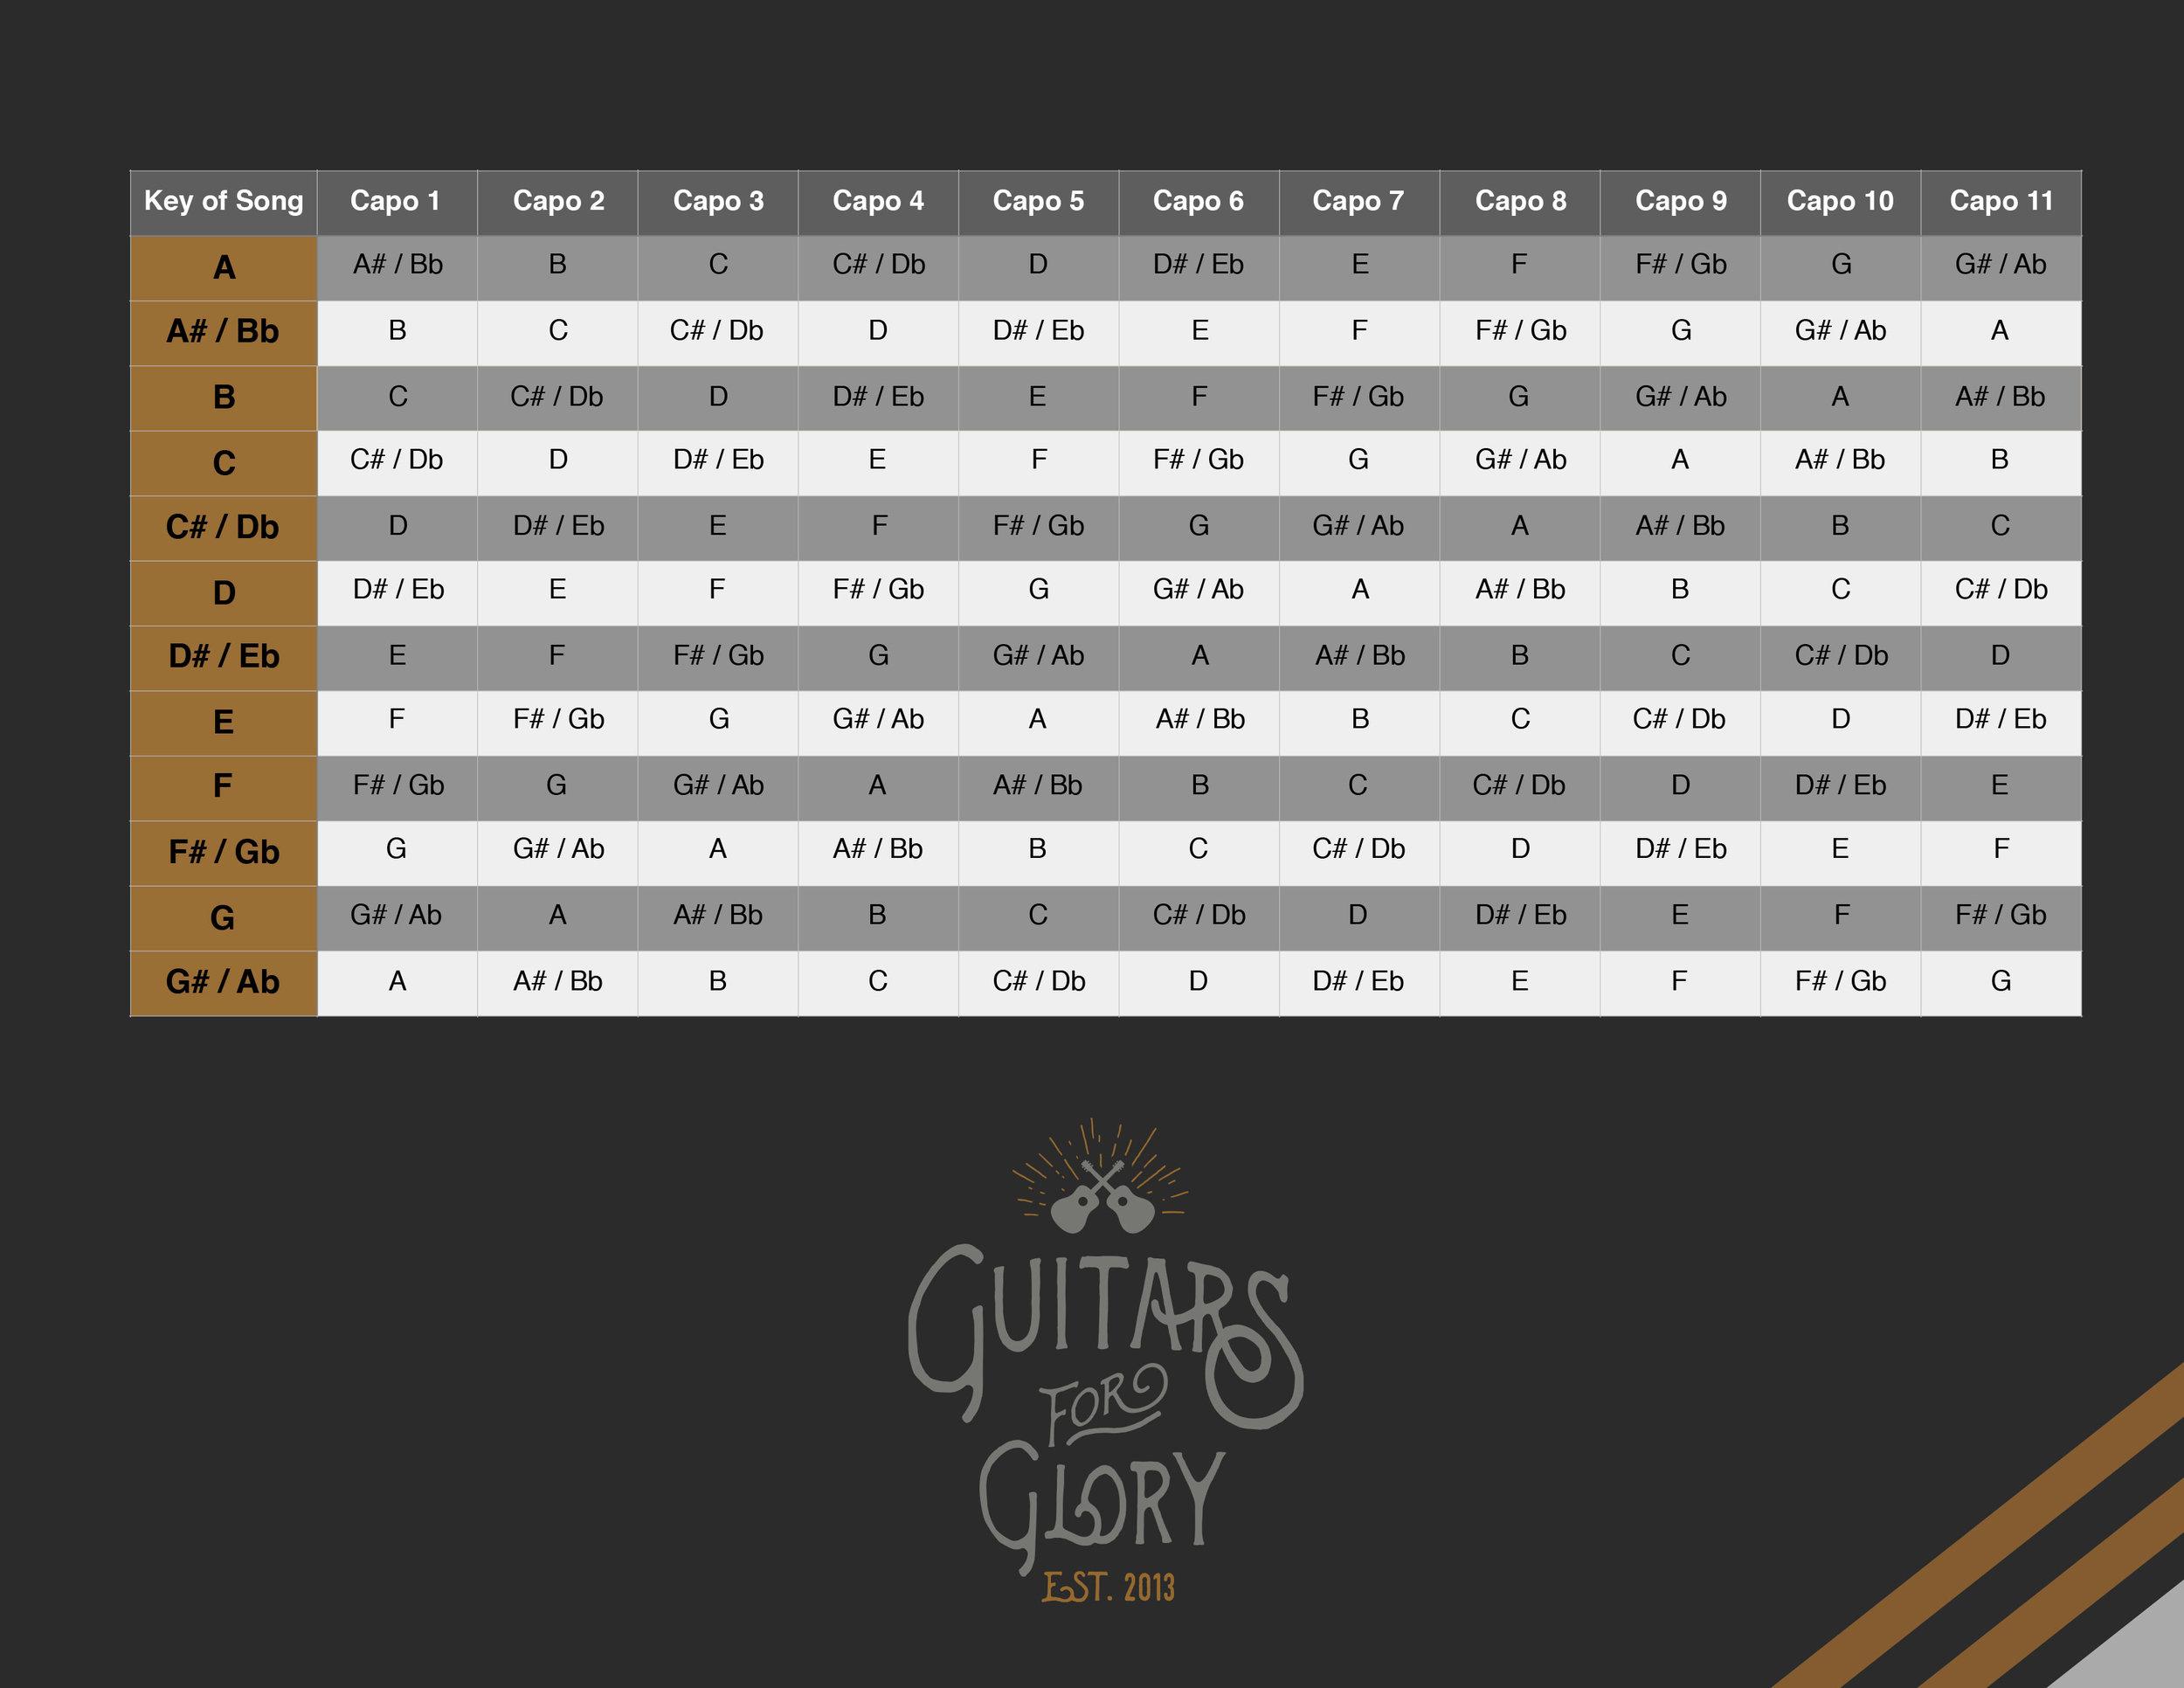 photo relating to Printable Guitar Capo Chart titled Capo Cheat Sheet